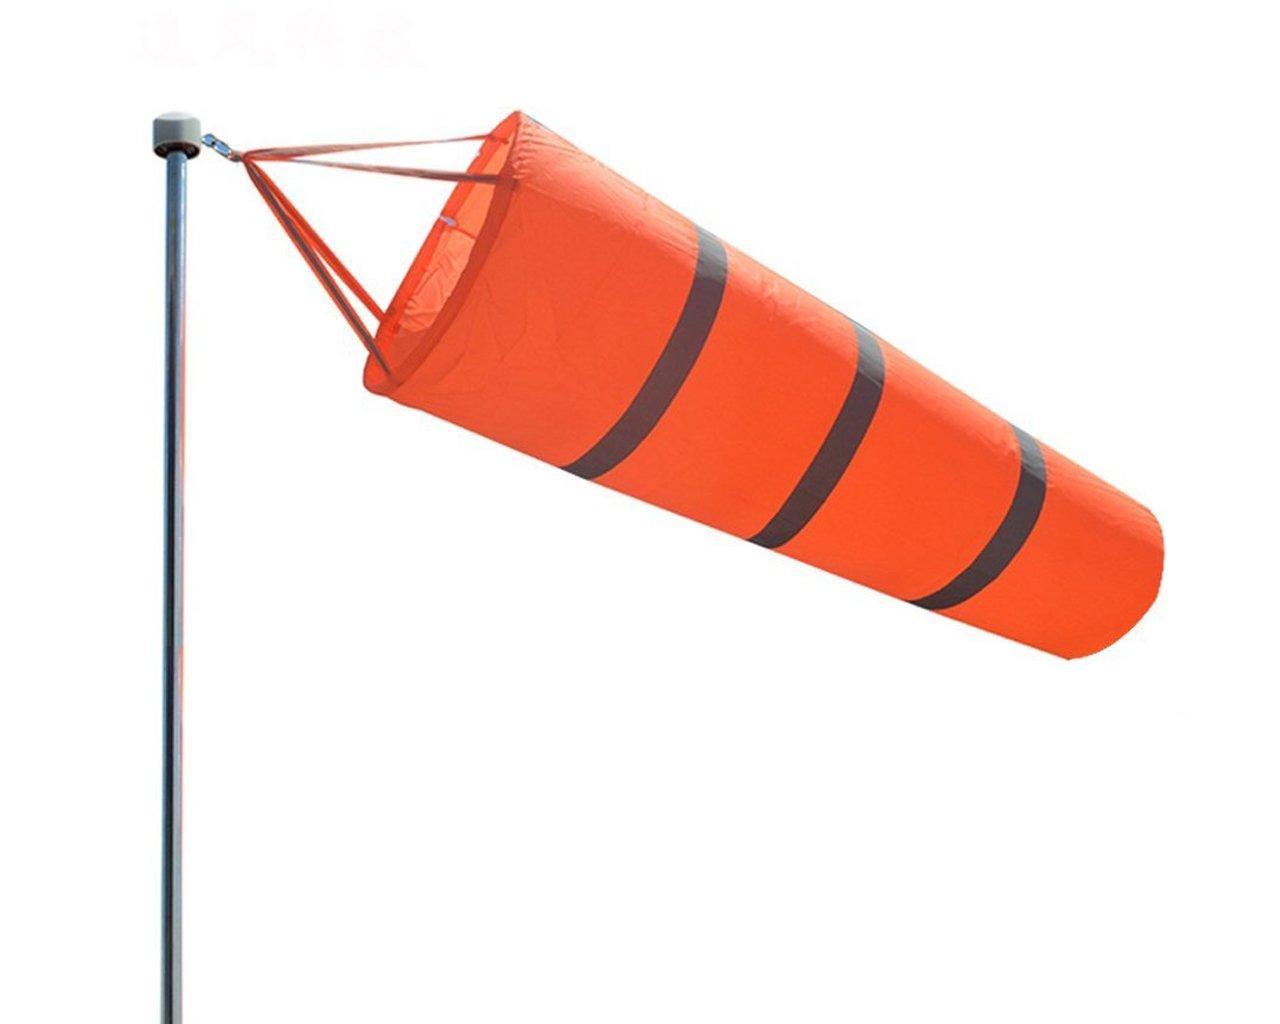 Directional Airport Windsock Orange Stripe Outdoor Windsock Measurement Sock Bag With Reflective Belt (100cm/39inch)